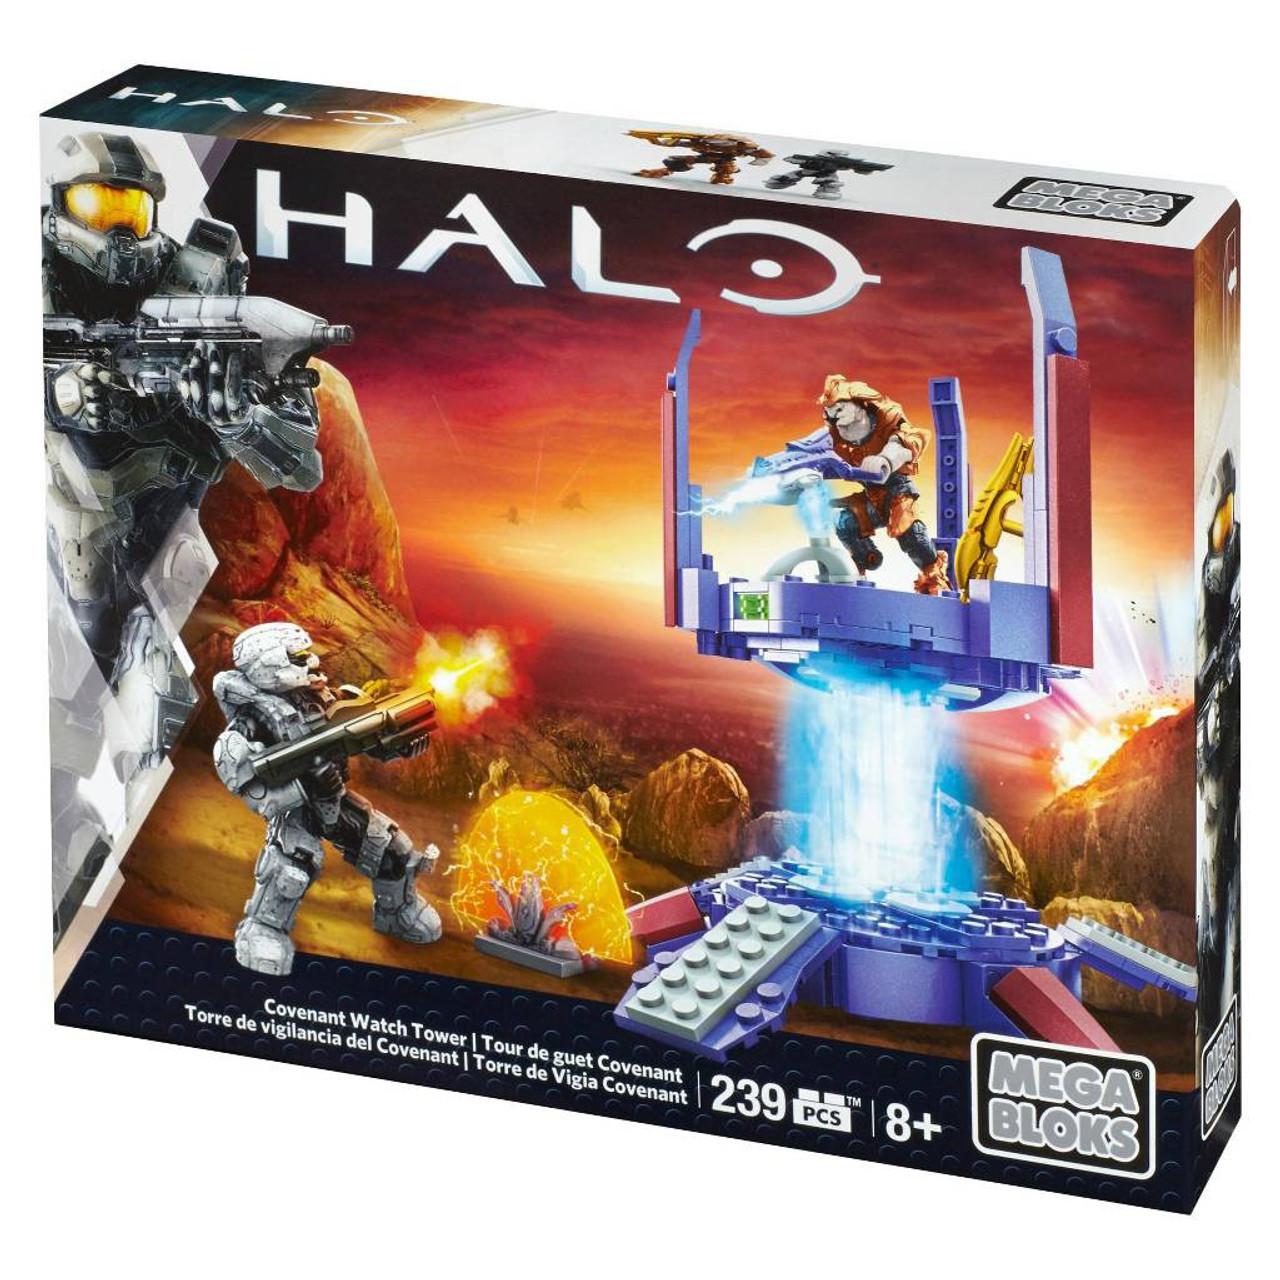 Mega Bloks Halo Covenant Watch Tower Set #24903